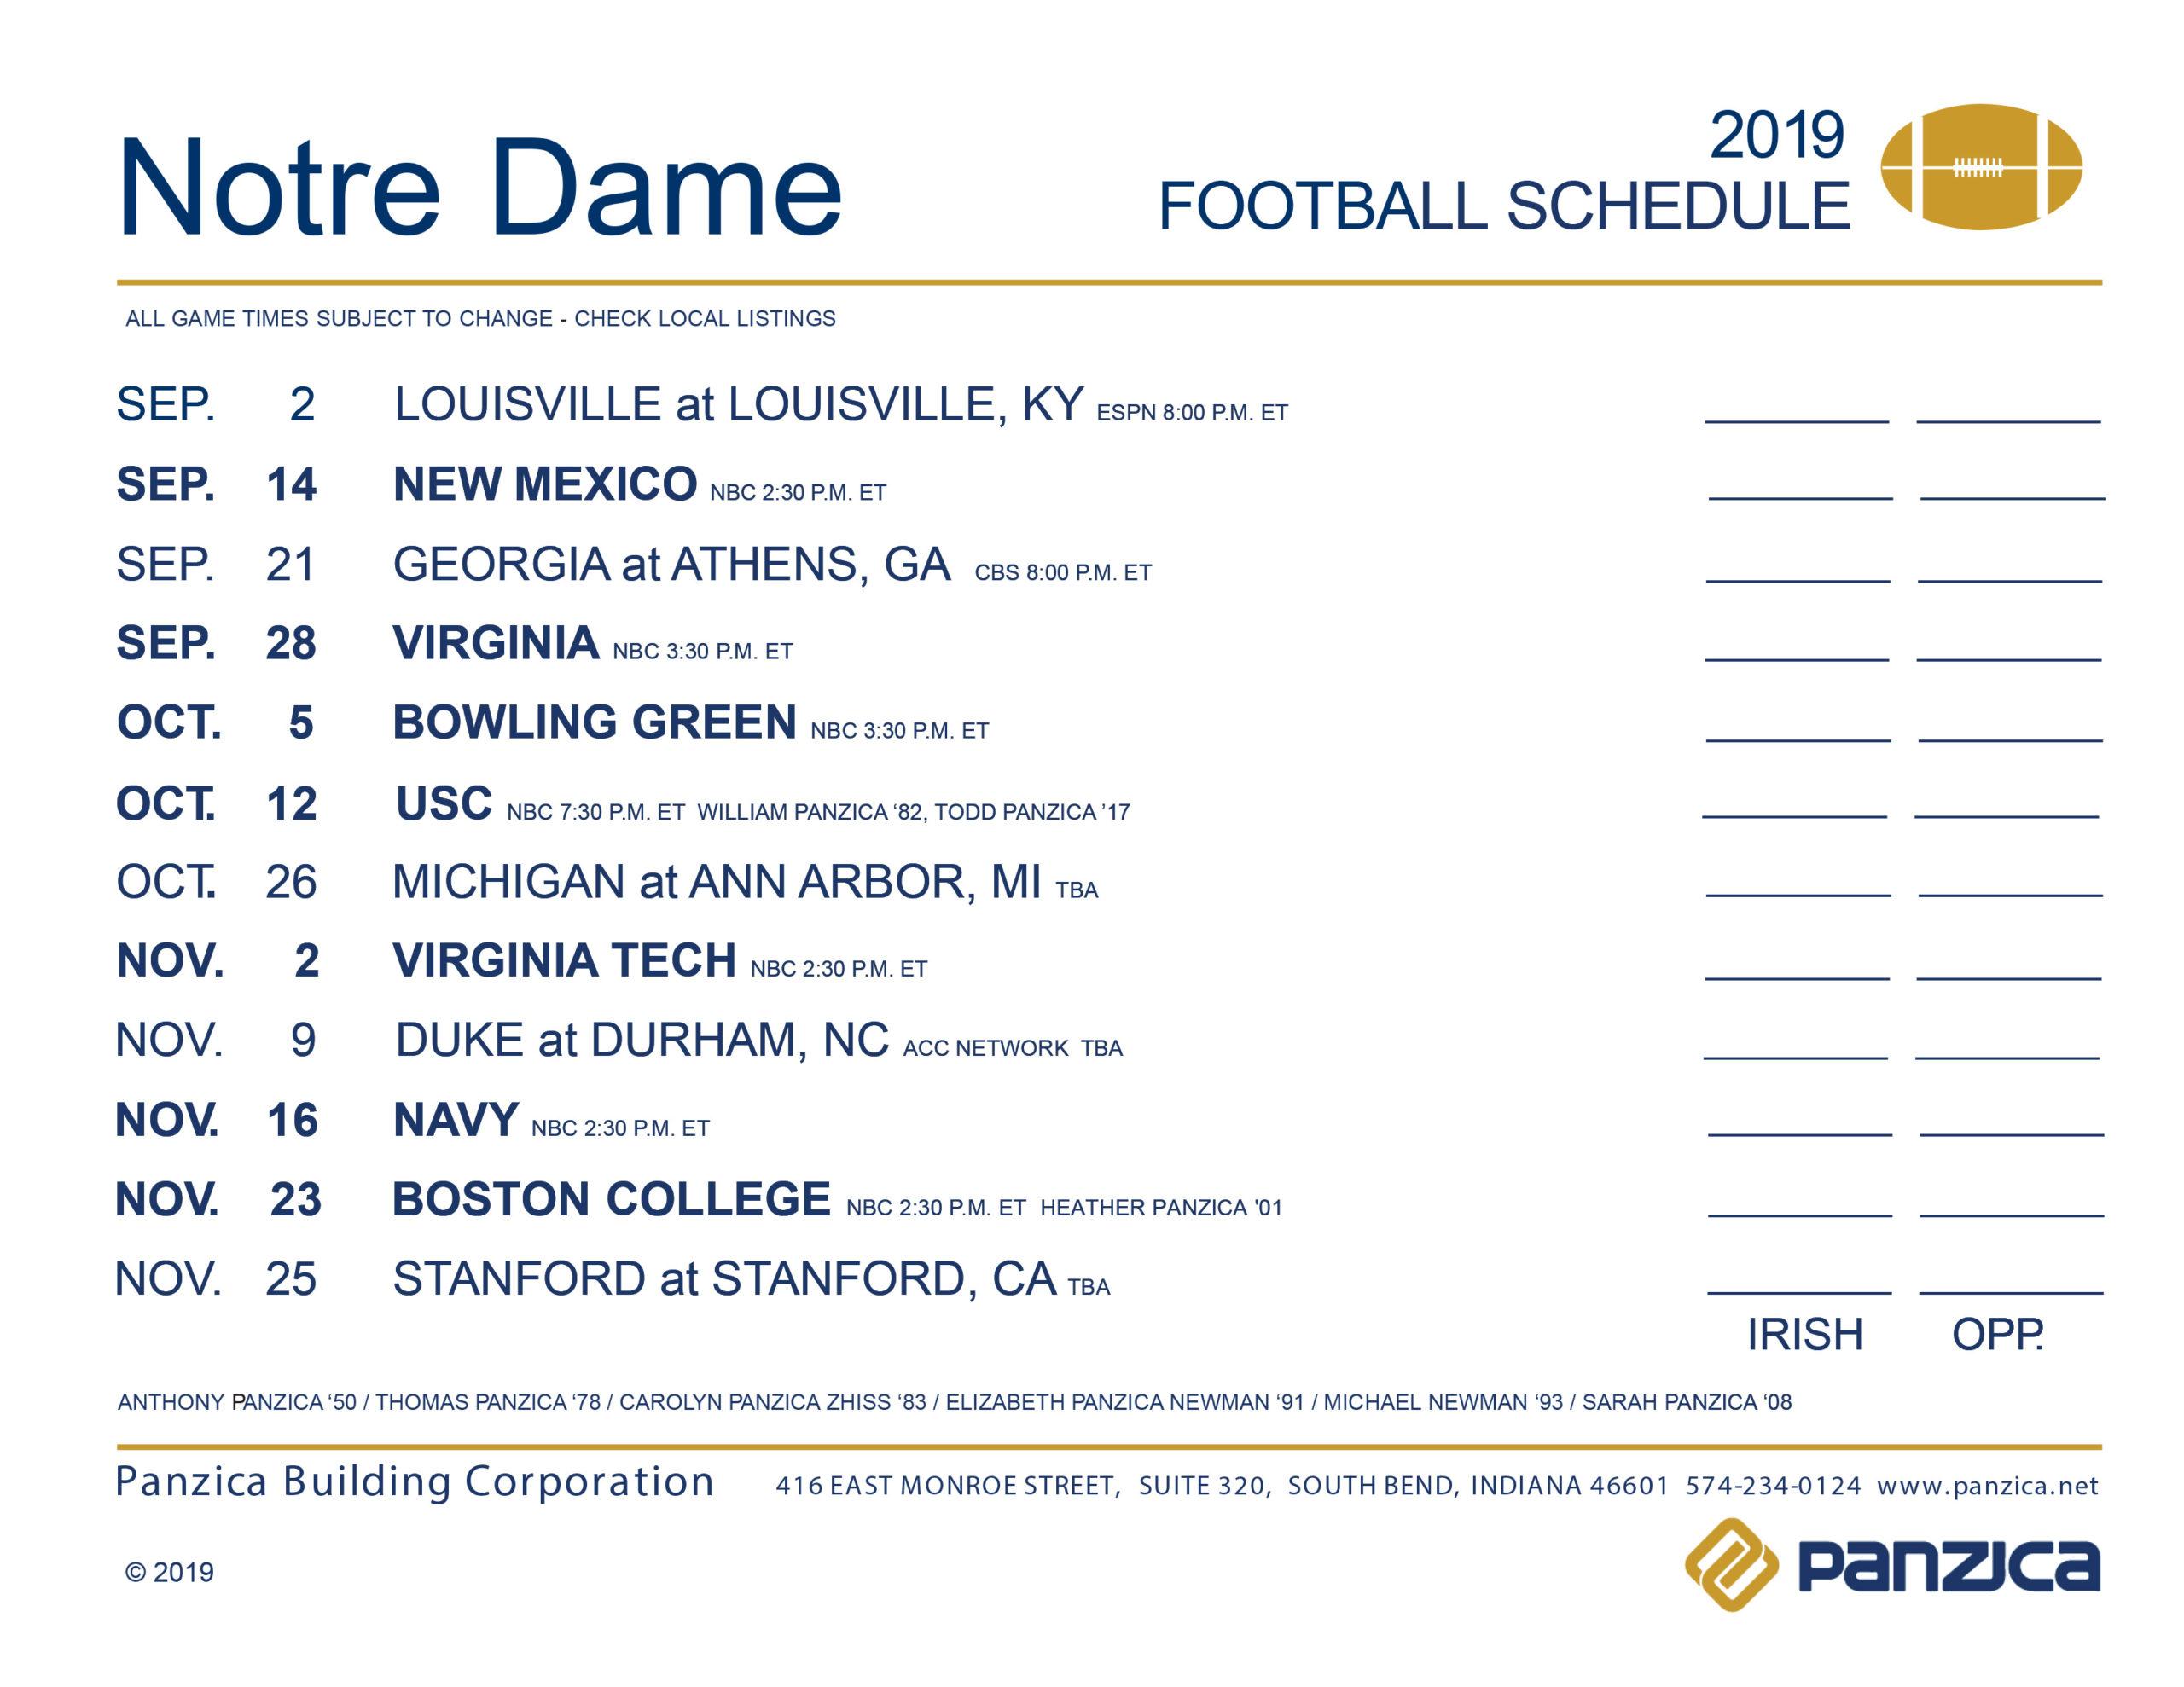 Notre Dame Football Schedule Panzica Building Corporation